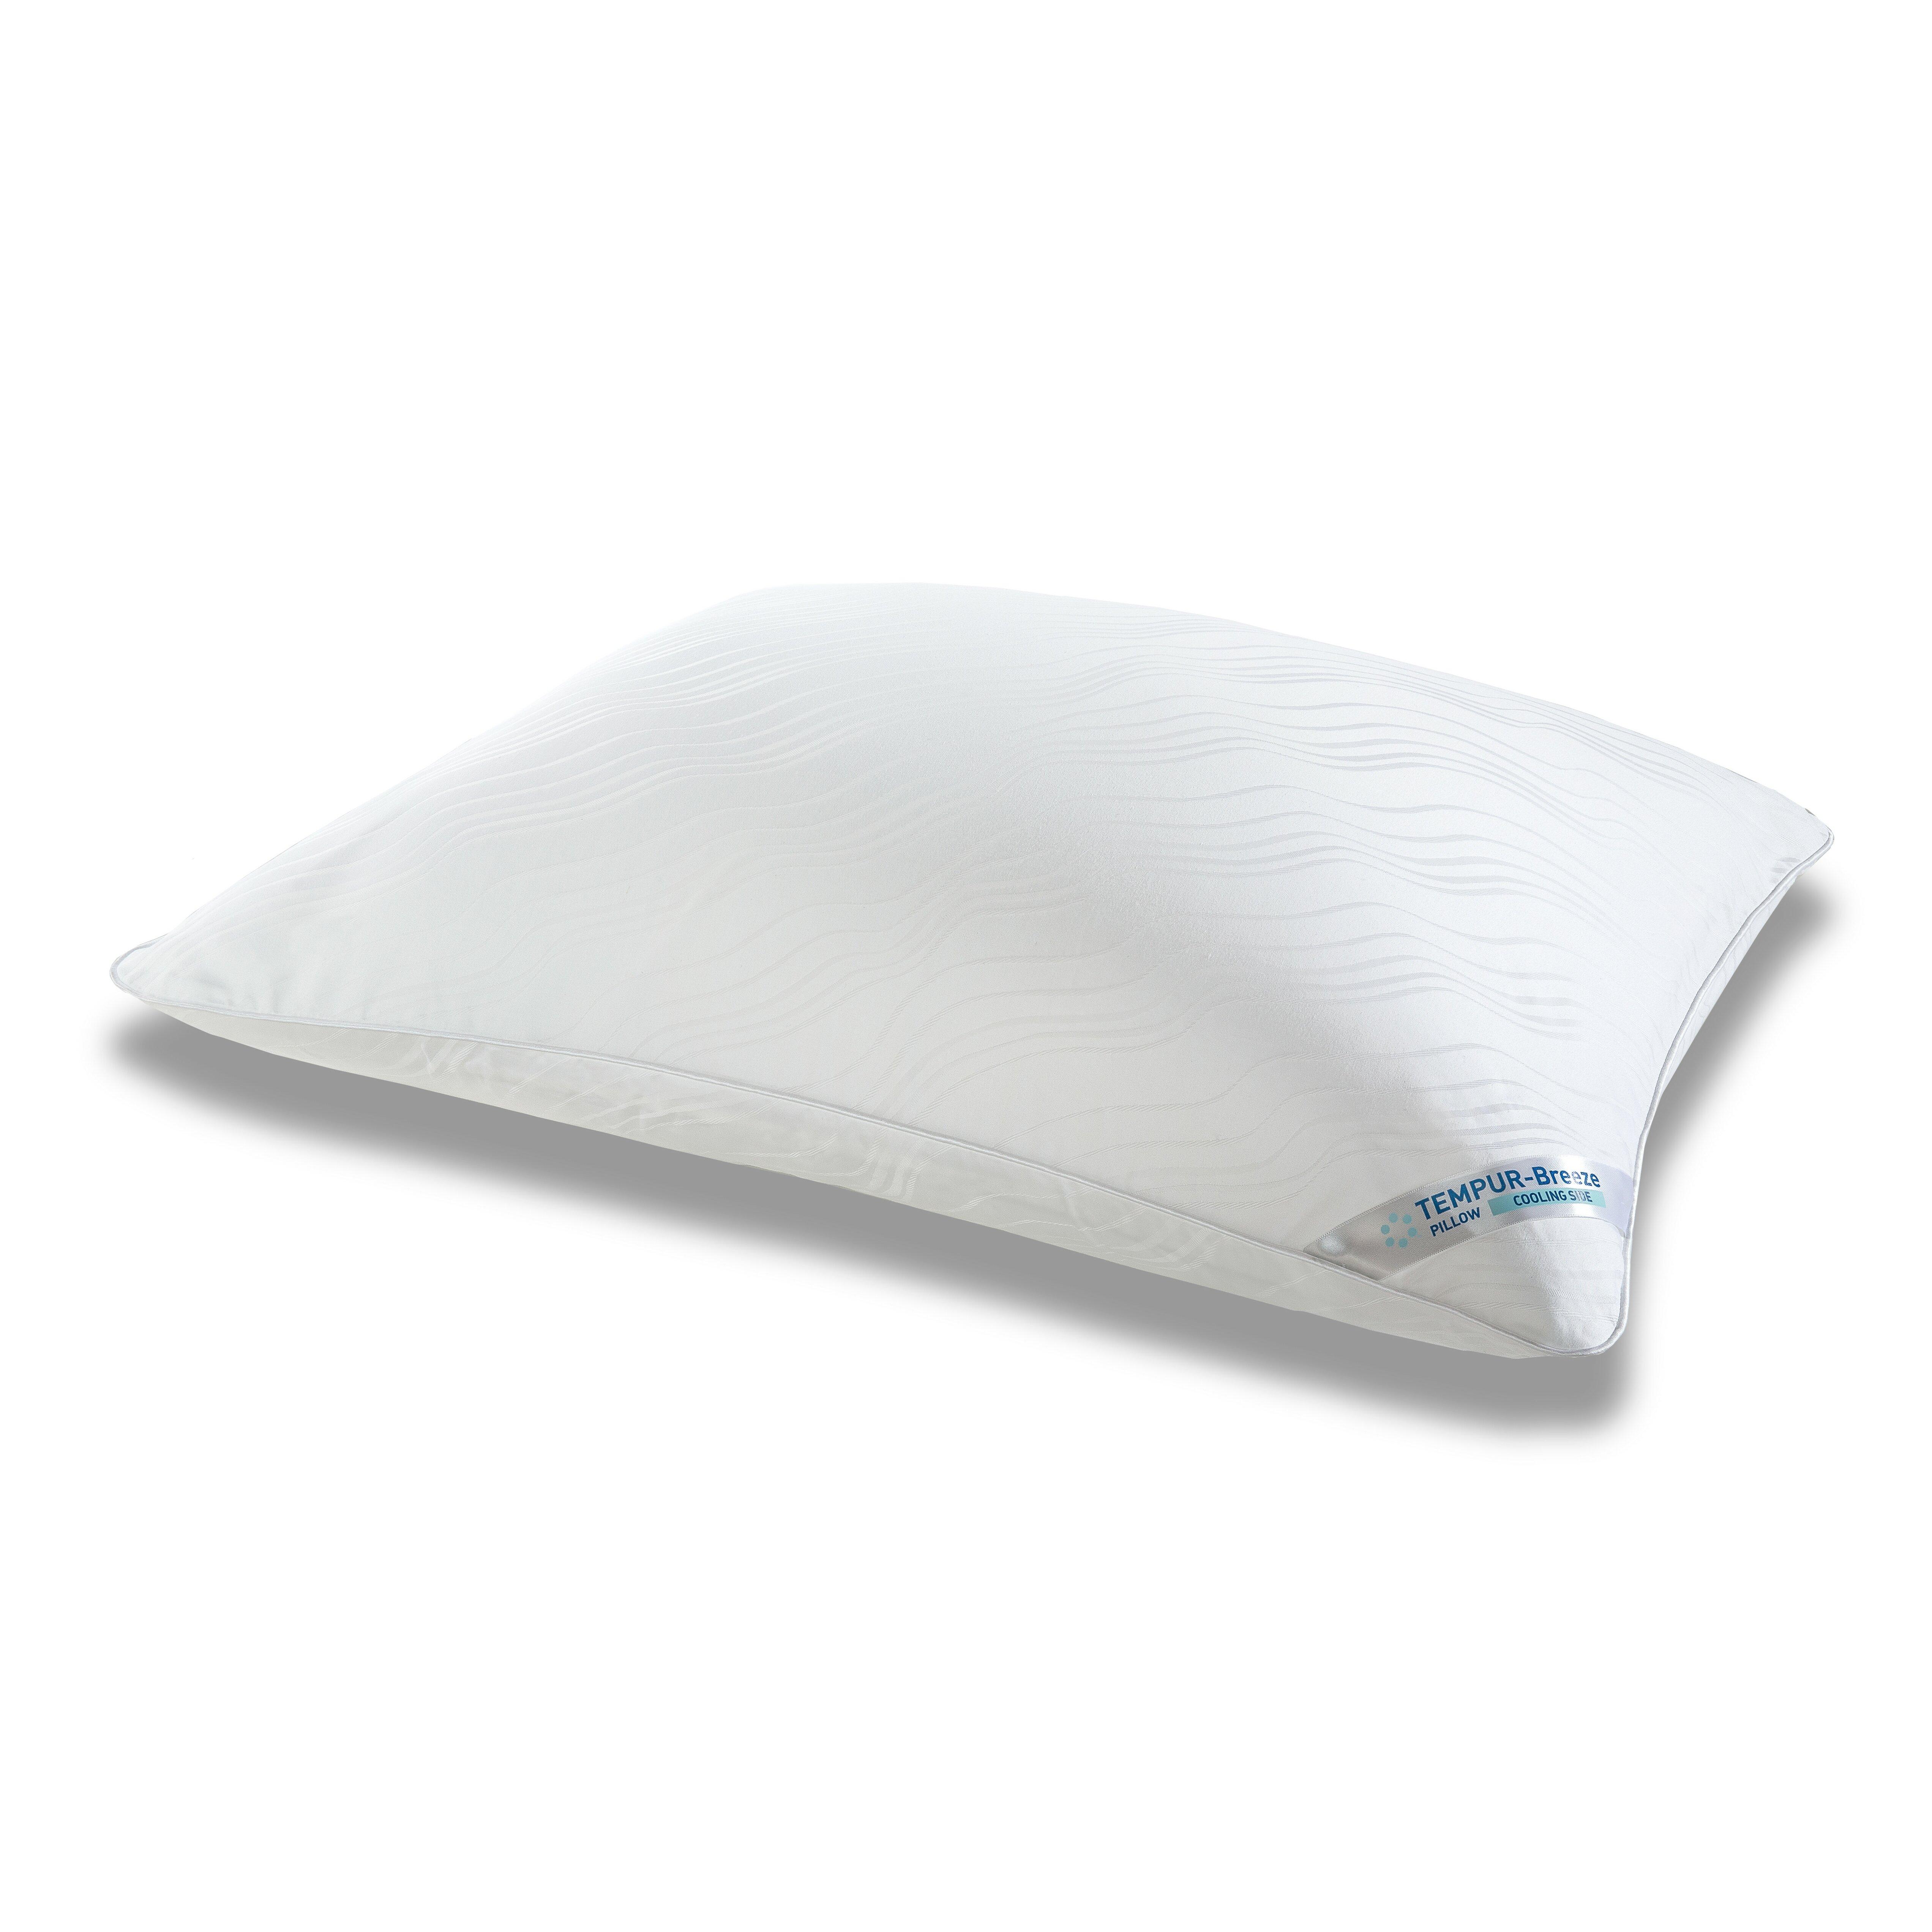 standard reversible sleep pillows soshichan cool memory and pedic gel of foam luxury ideas org modern pillow tempurpedic tempur